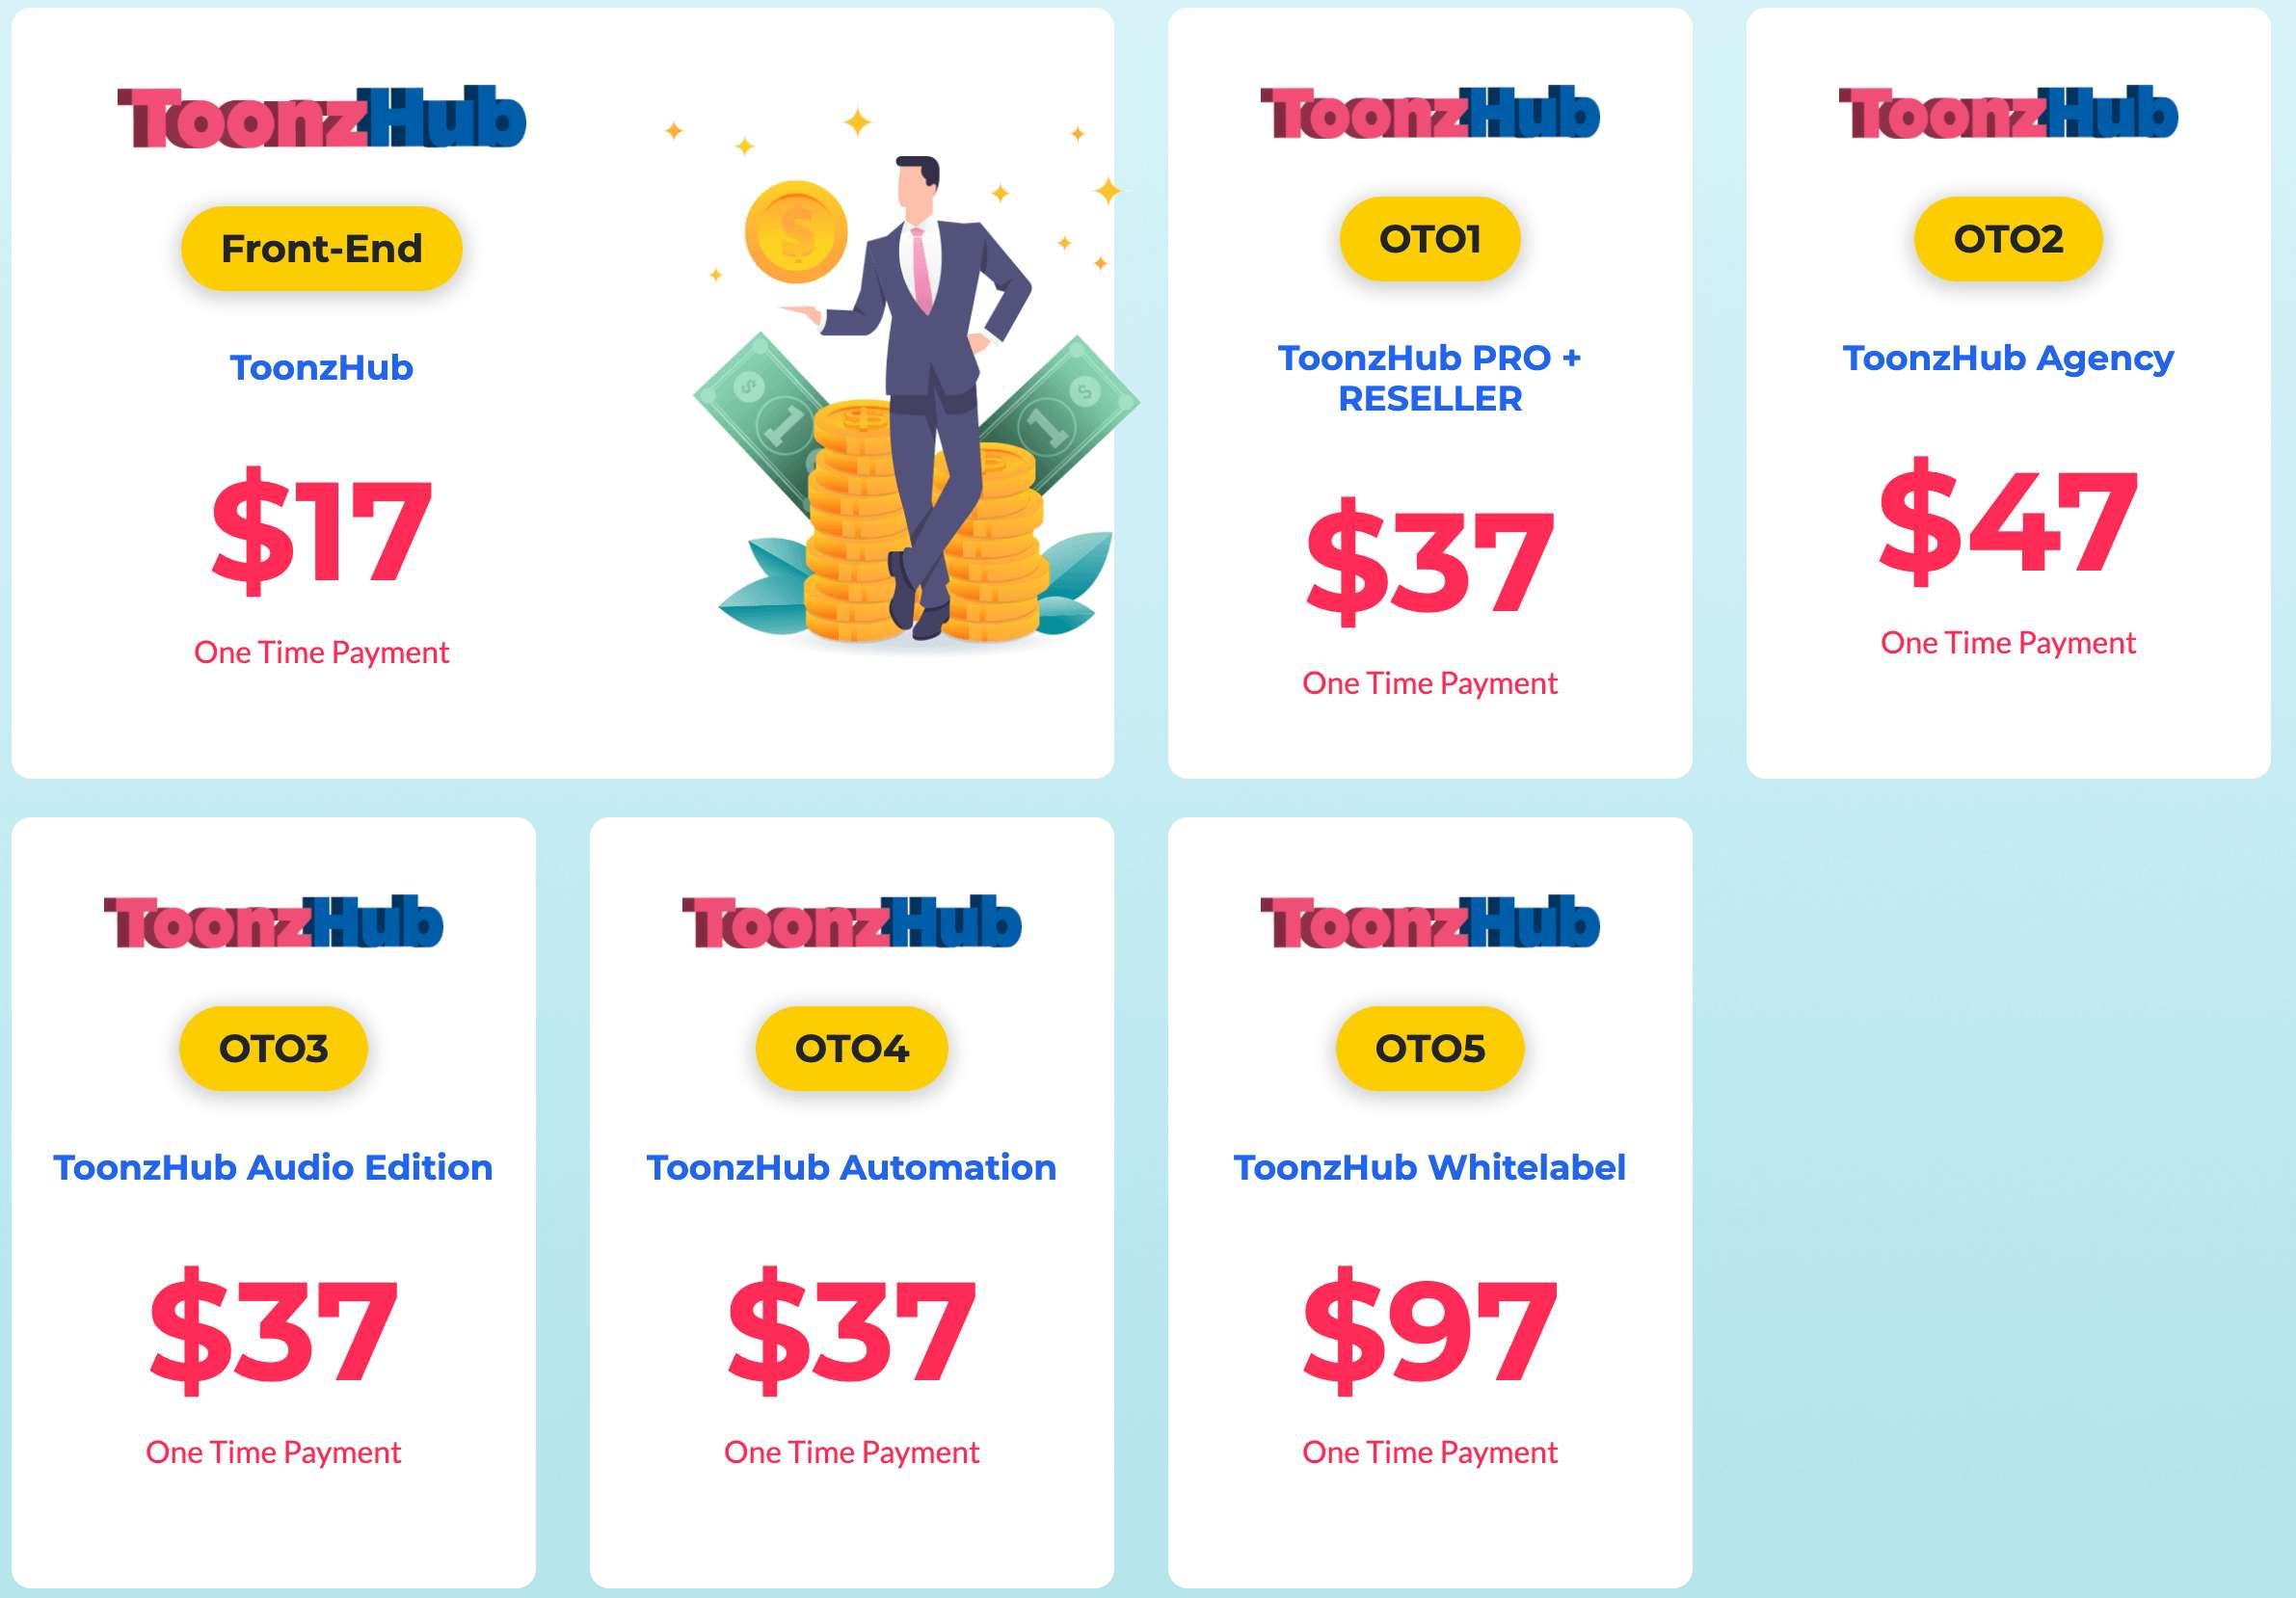 ToonzHub Review: Pricing & Upsells